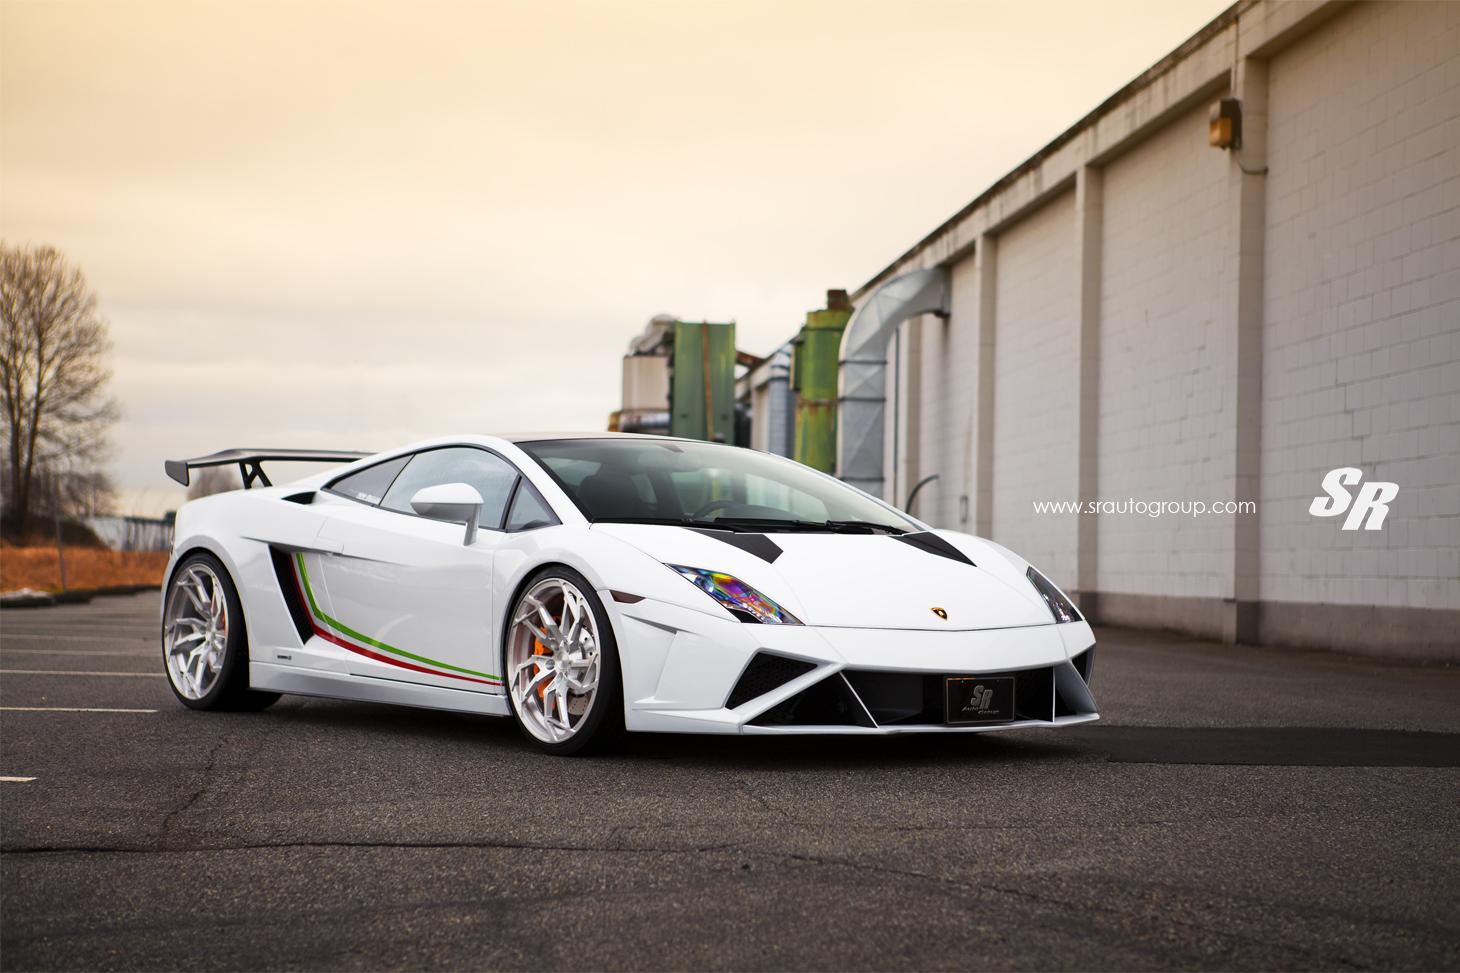 White Lamborghini Gallardo Lp560 4 Stuns With Pur Wheels